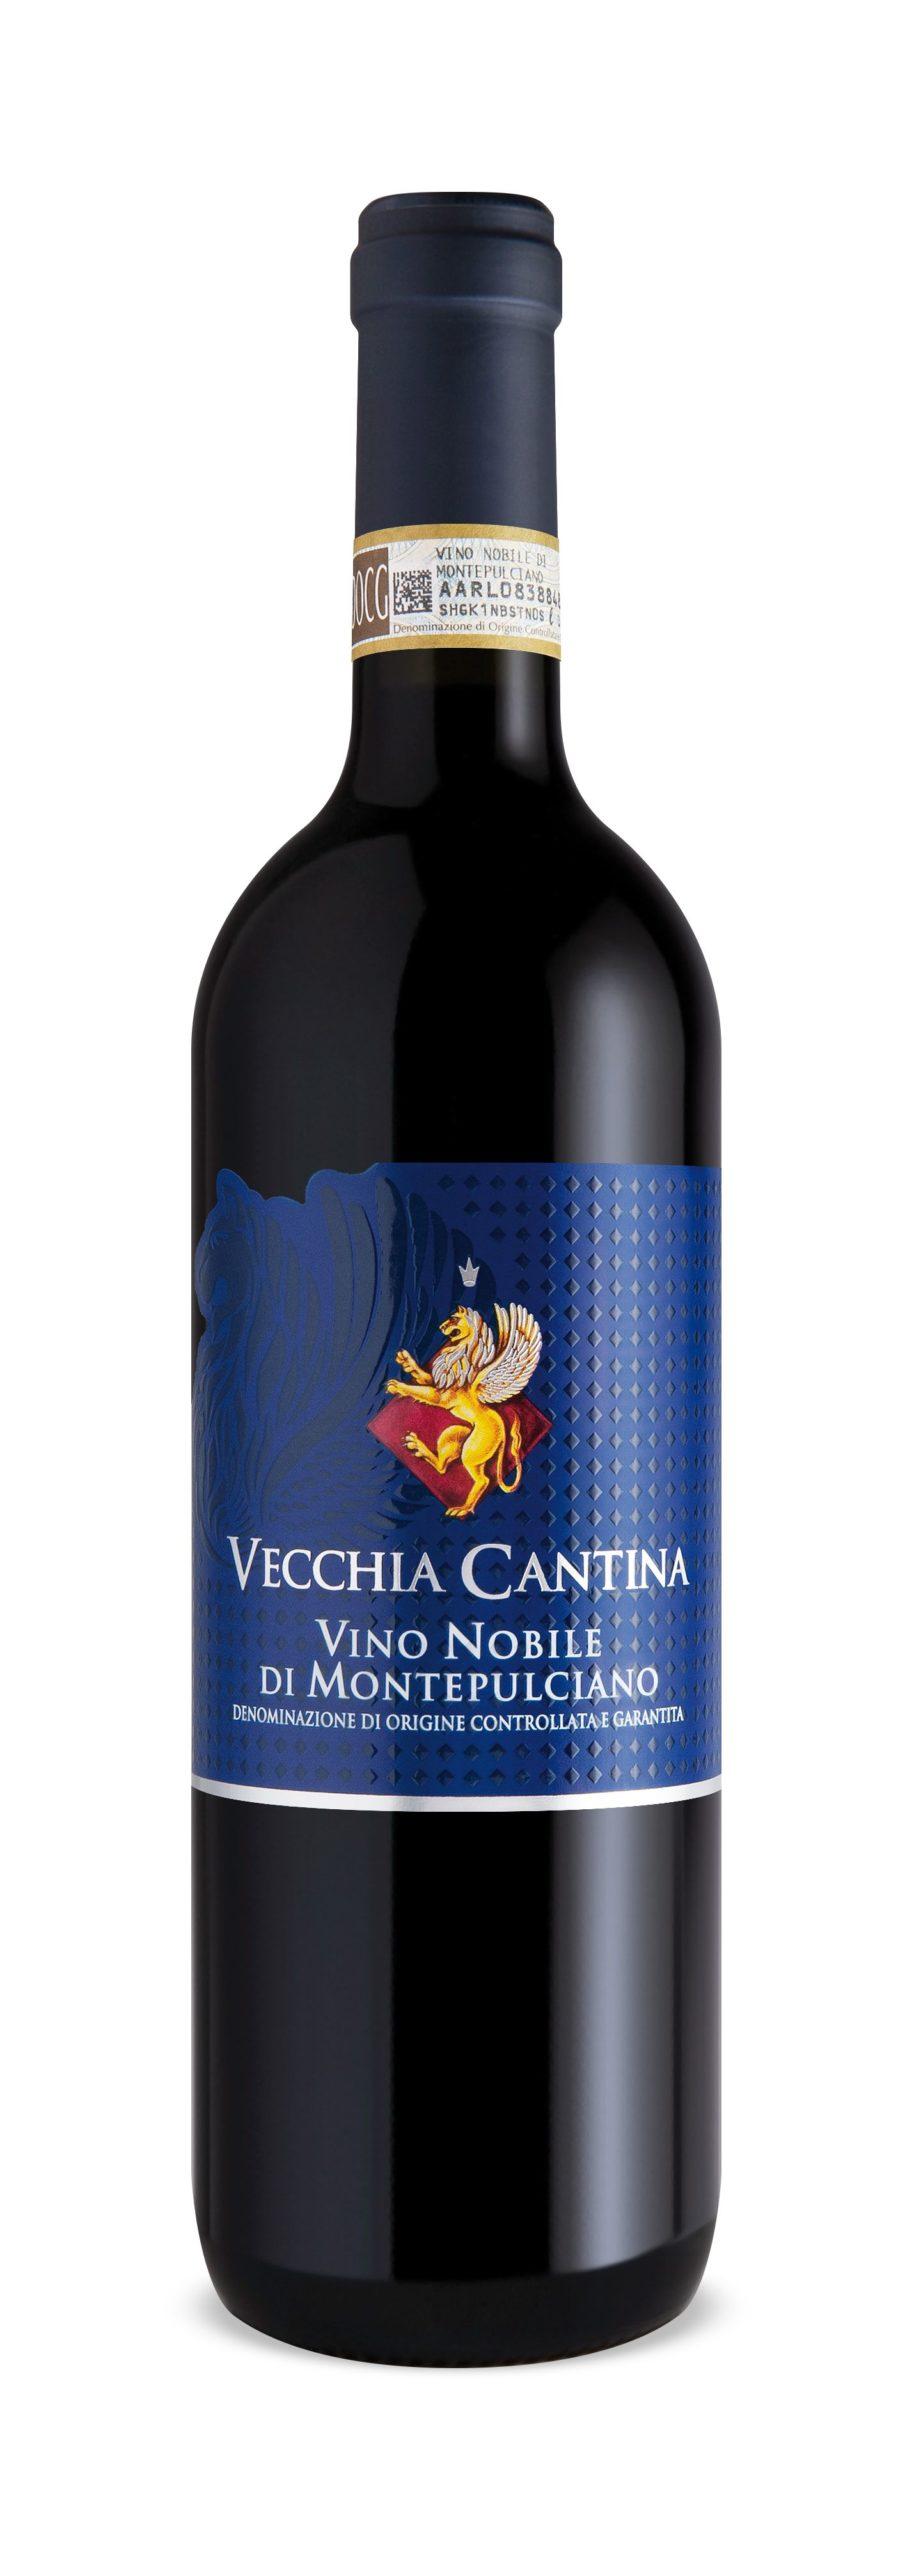 Vino Nobile di Montepulciano DOCG TOSCANA